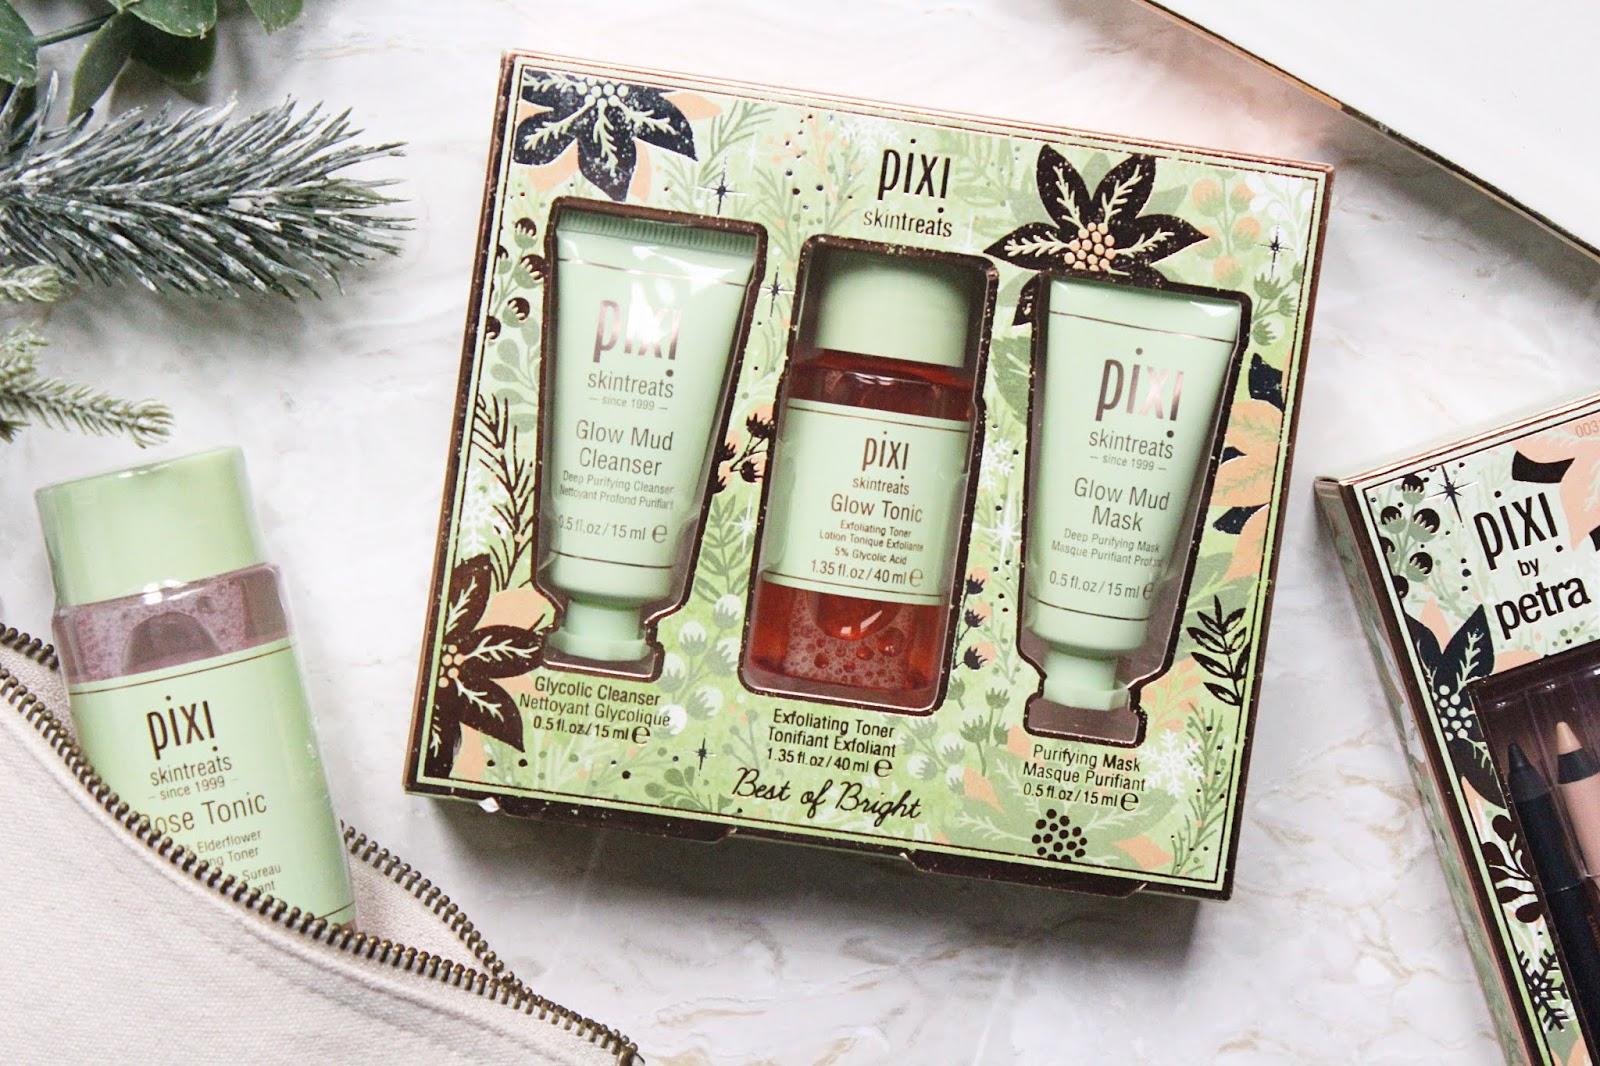 Pixi Christmas Gift Set Top Picks